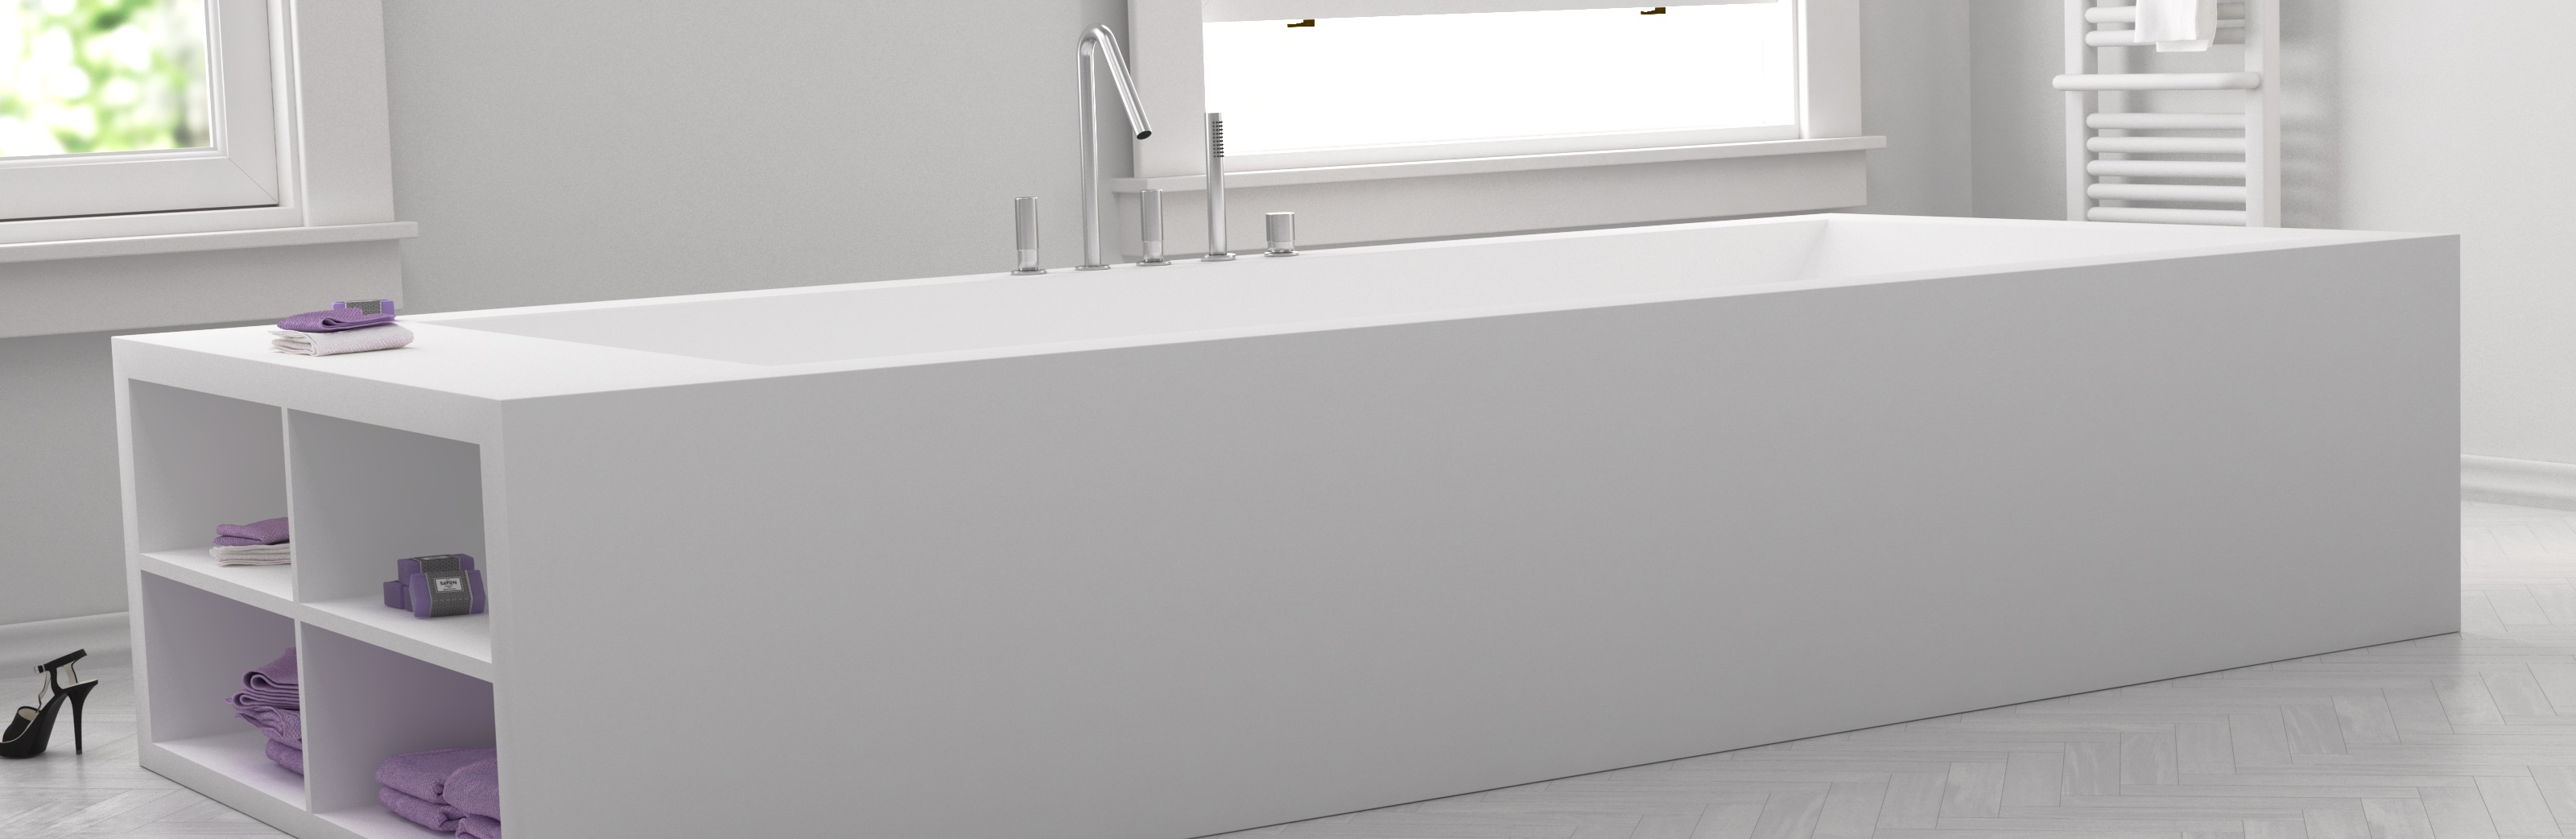 estonecril france salles de bain haut de gamme en corian